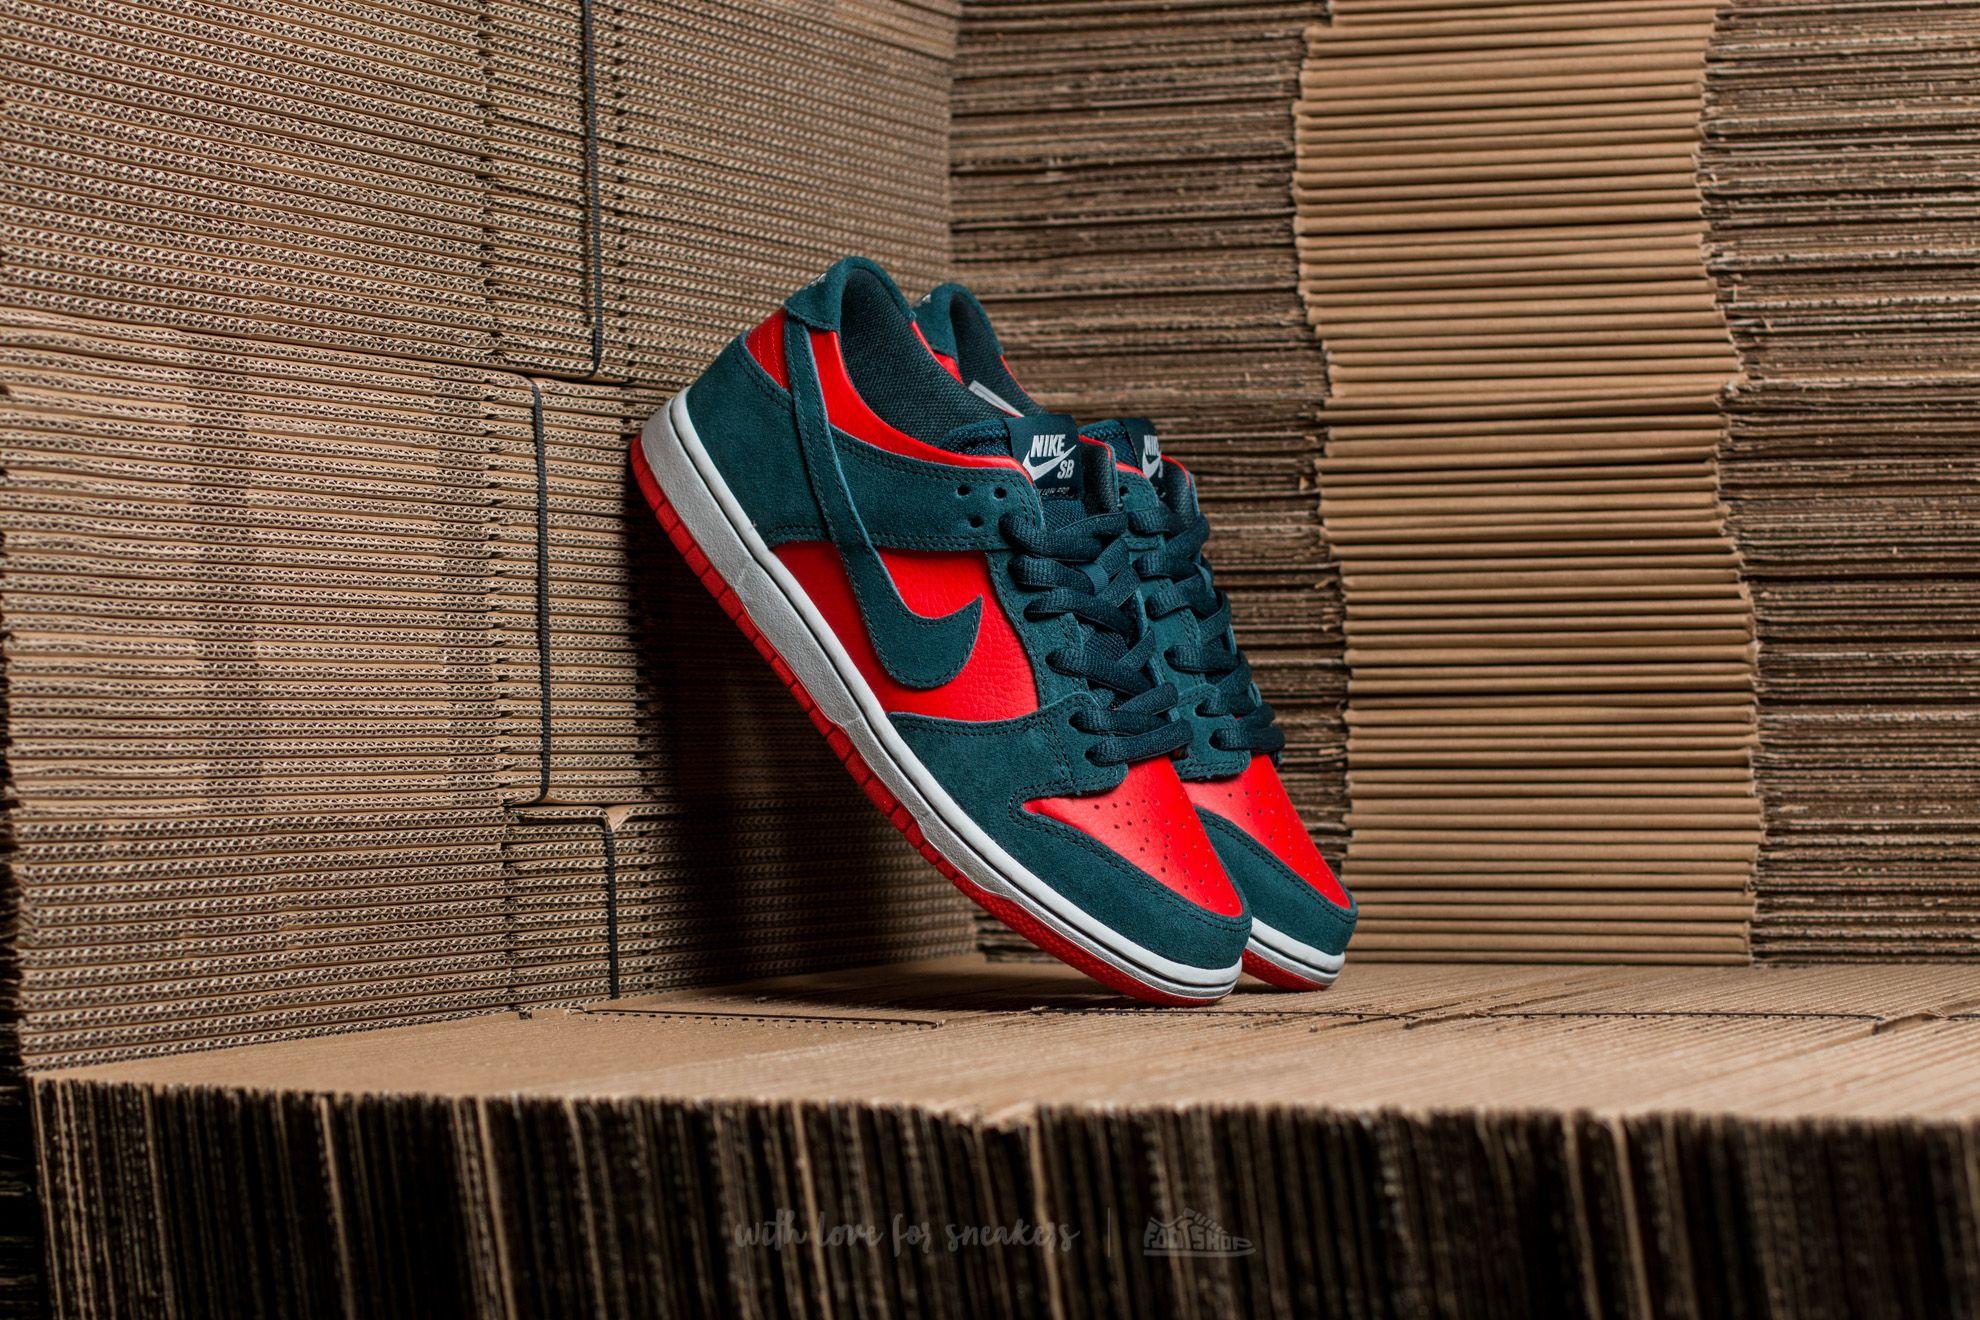 a4e58b994f48 Nike SB Zoom Dunk Low Pro Nightshade  Nightshade